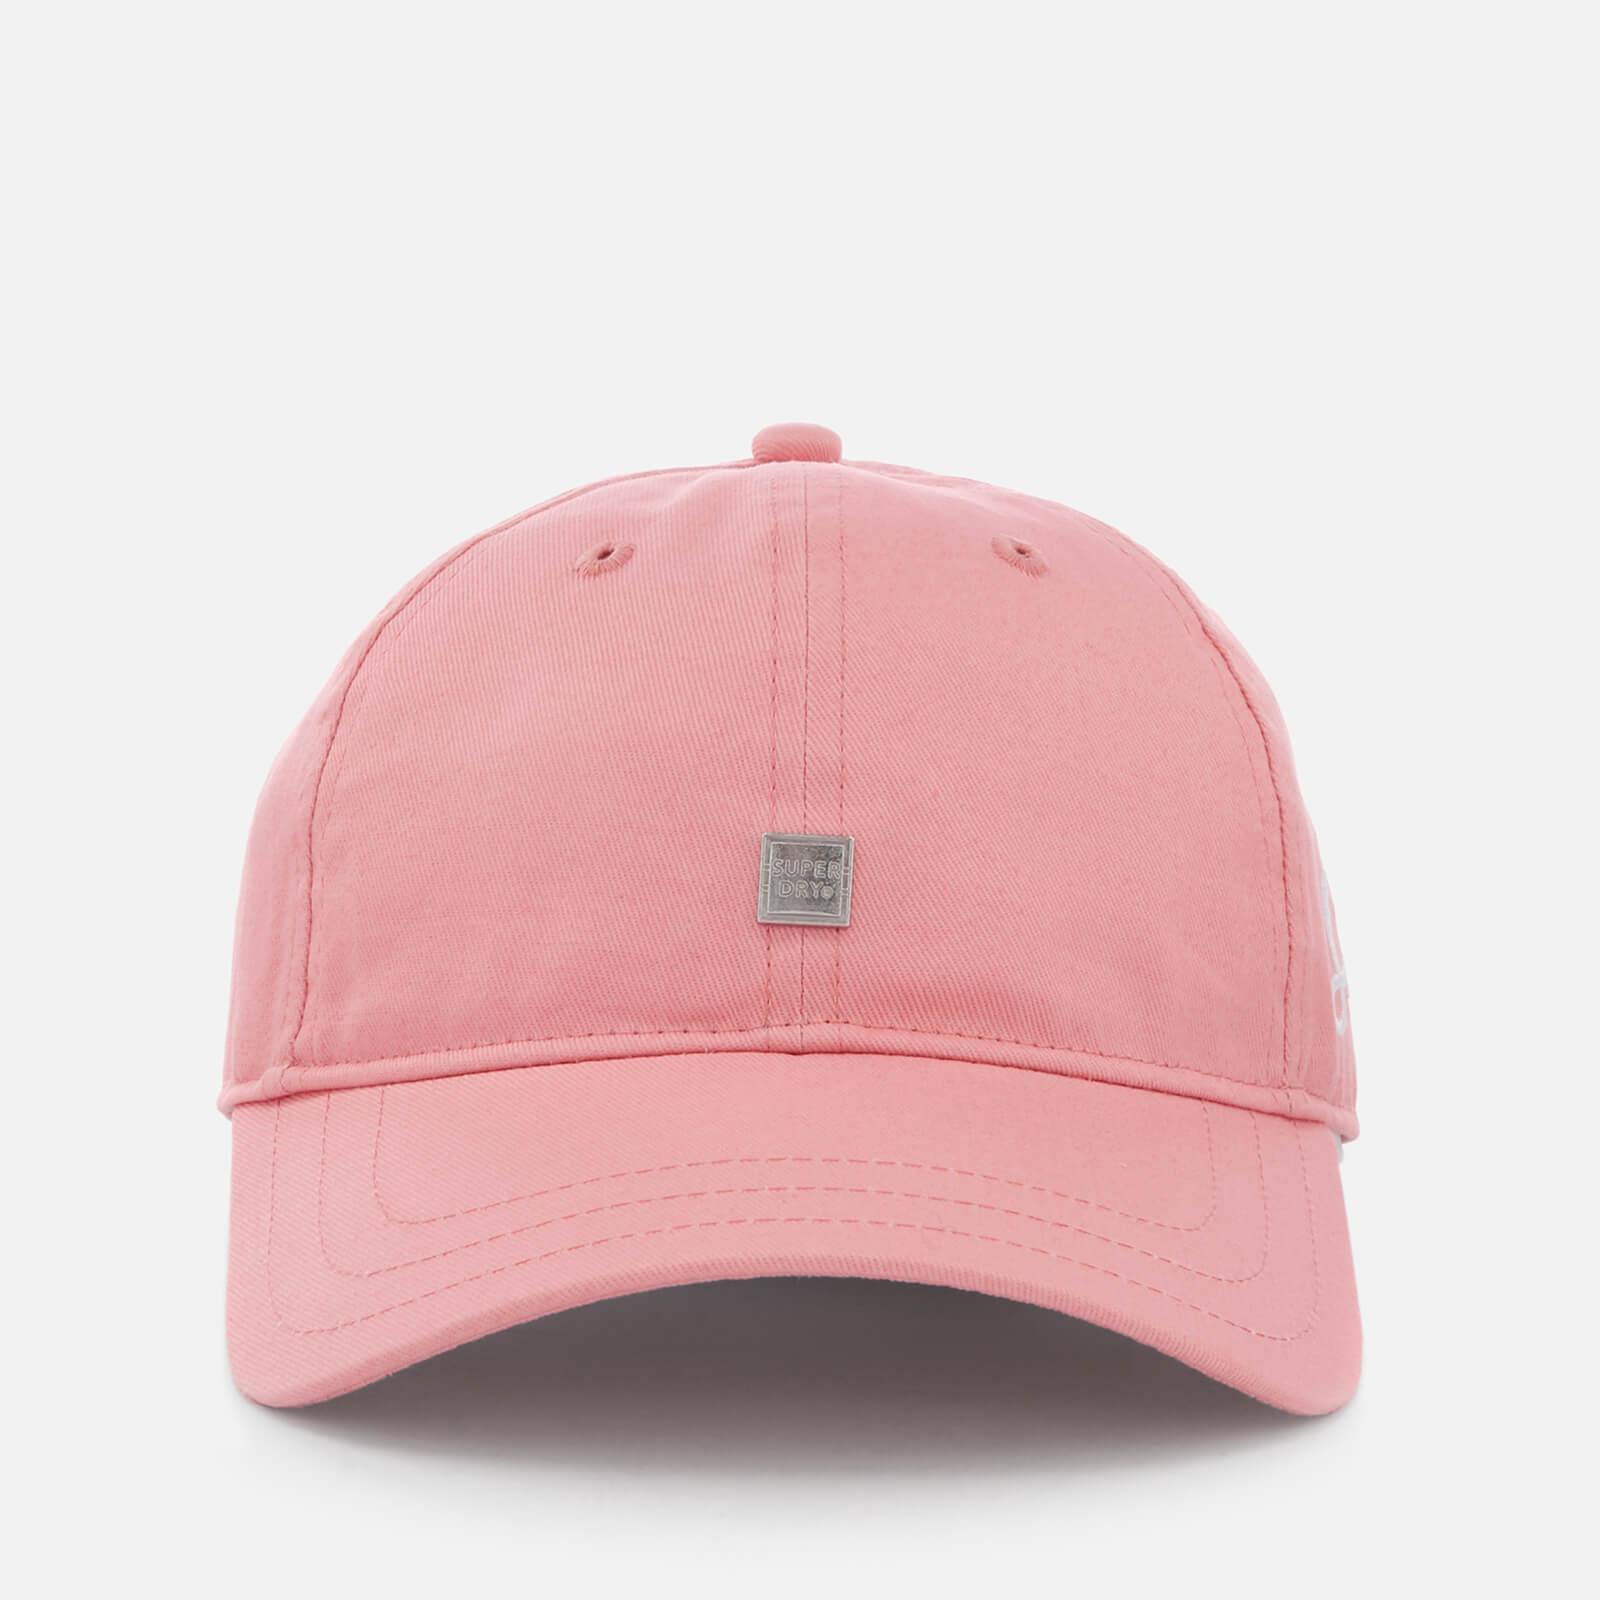 3f86668a4 Superdry Women's Script Cap - Pink Womens Accessories | TheHut.com